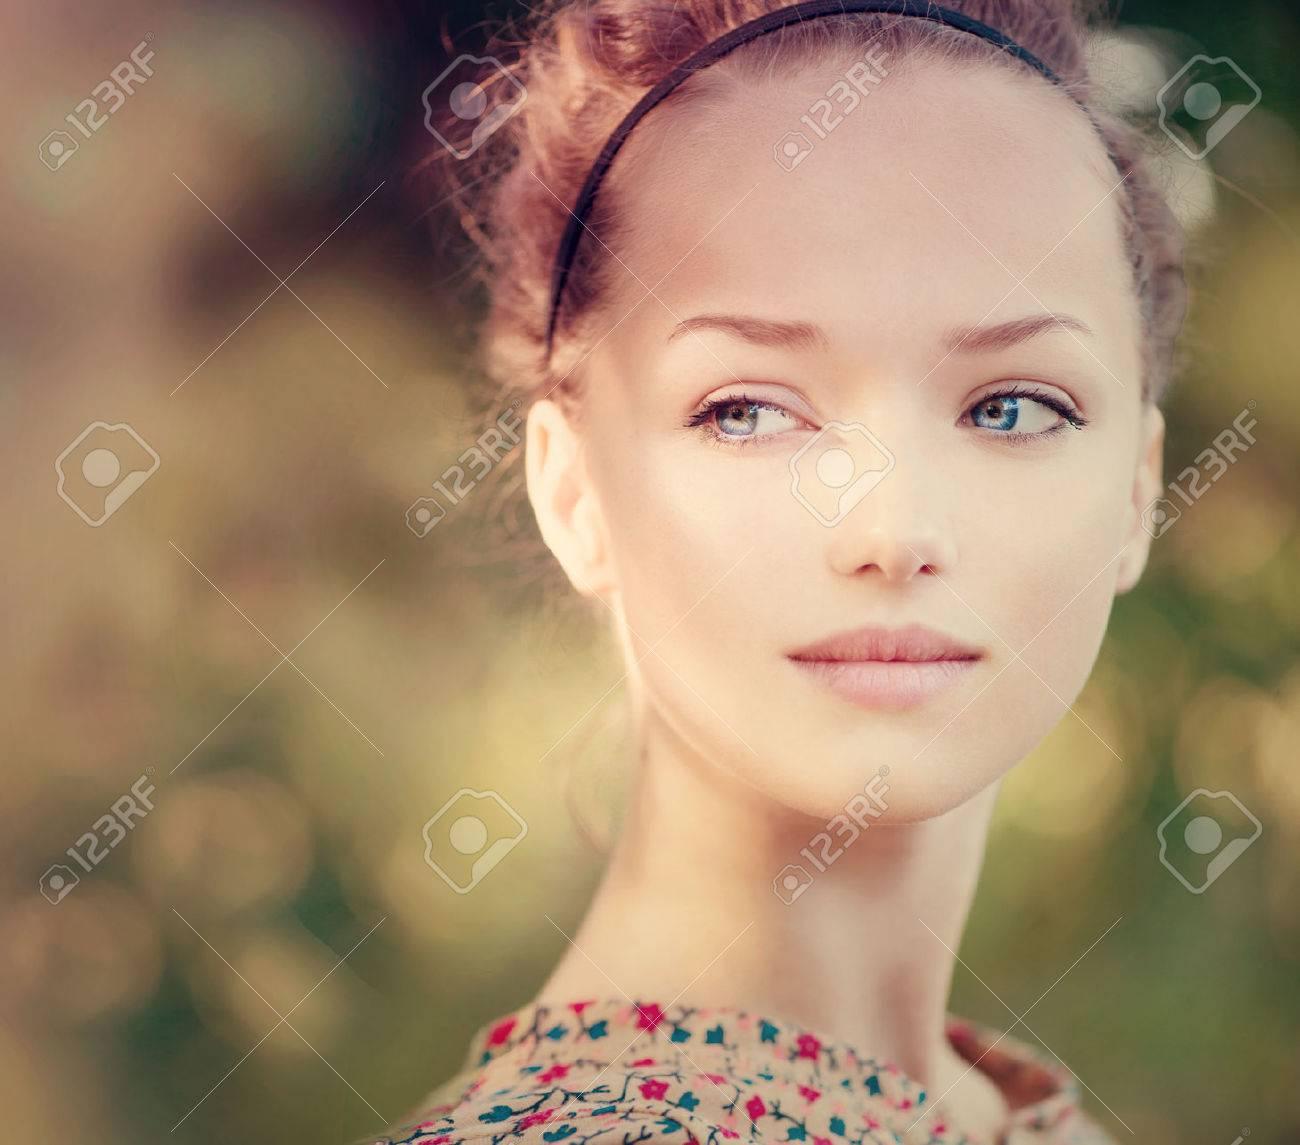 Beauty Romantic Girl Outdoor  Beautiful Teenage Model Stock Photo - 24640837